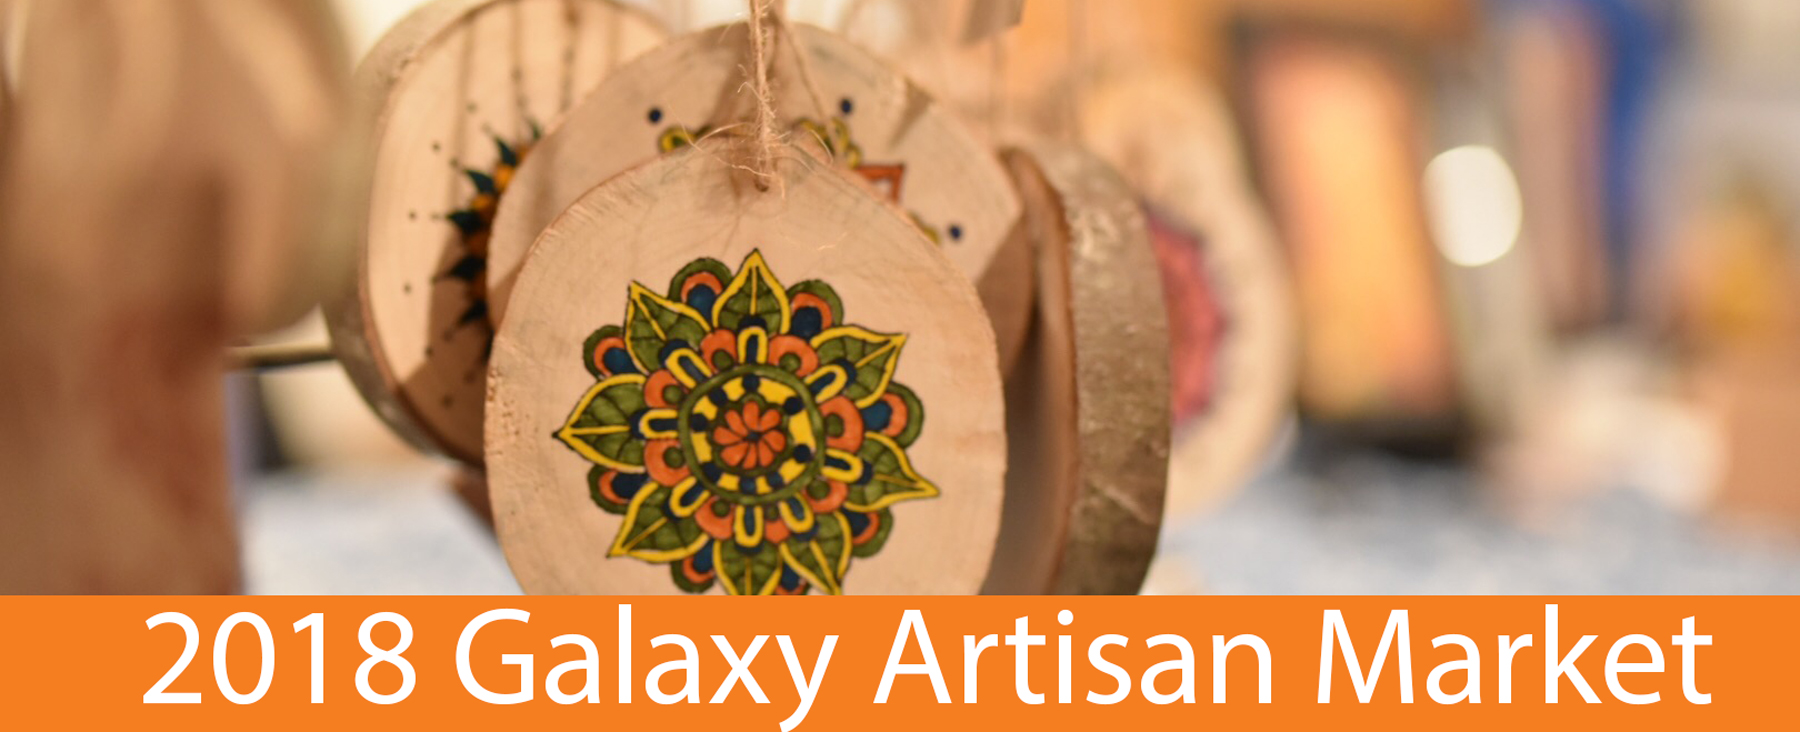 galaxy-artisan-market-2018